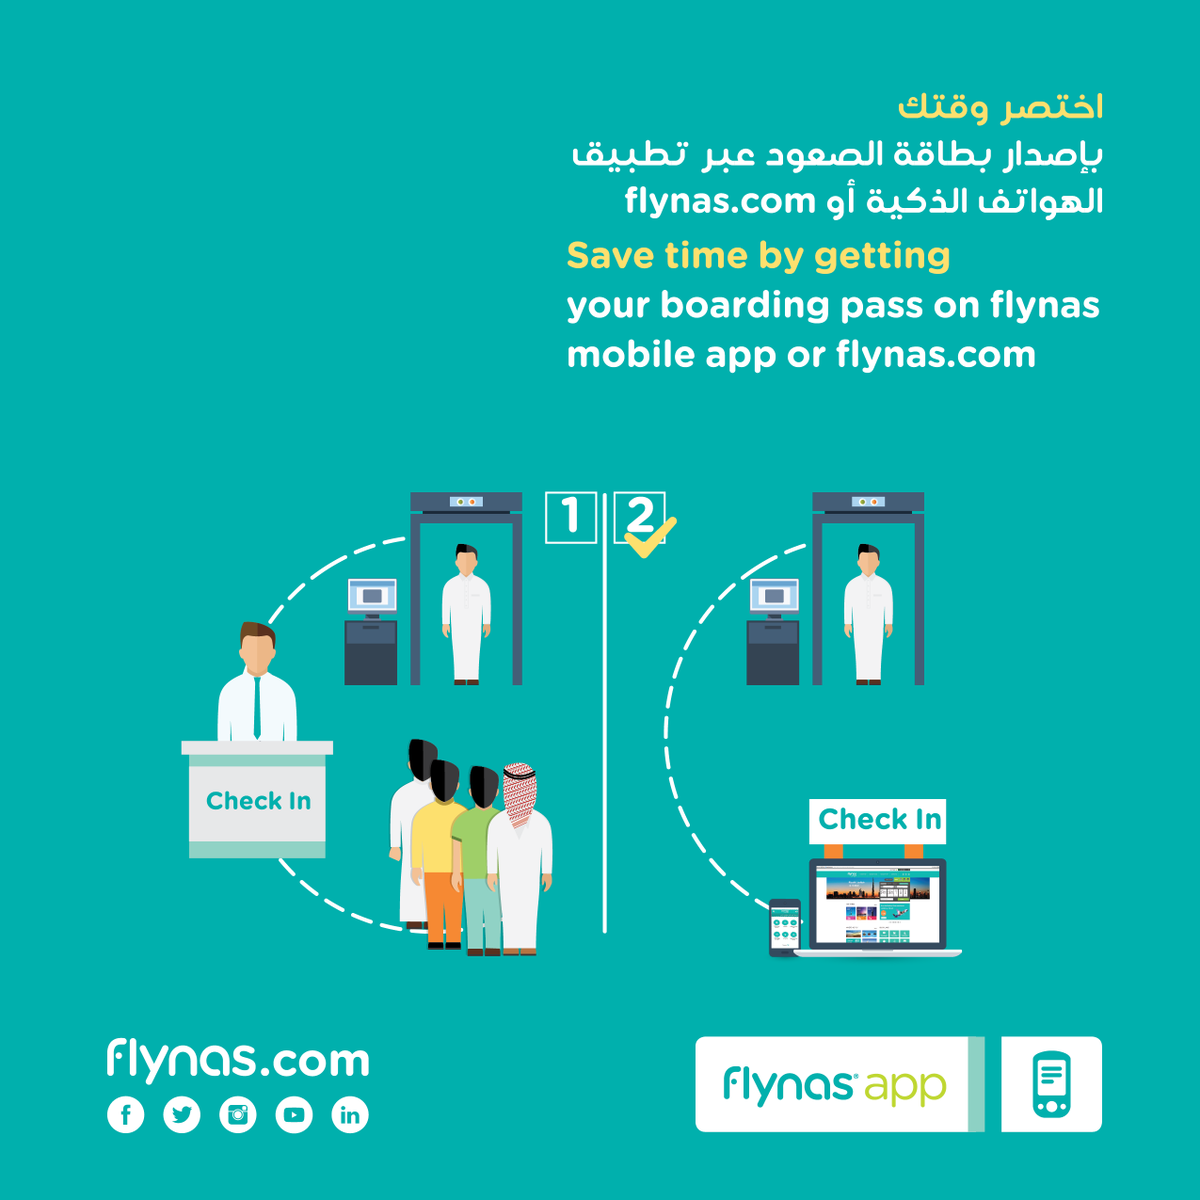 Flynas طيران ناس V Twitter إختصر وقتك بإصدار بطاقة صعود الطائرة الكترونيا عبر تطبيق الهواتف الذكية أو عن طريق الرابط Http T Co Zxtzno61u7 Http T Co H51hvj8i1s